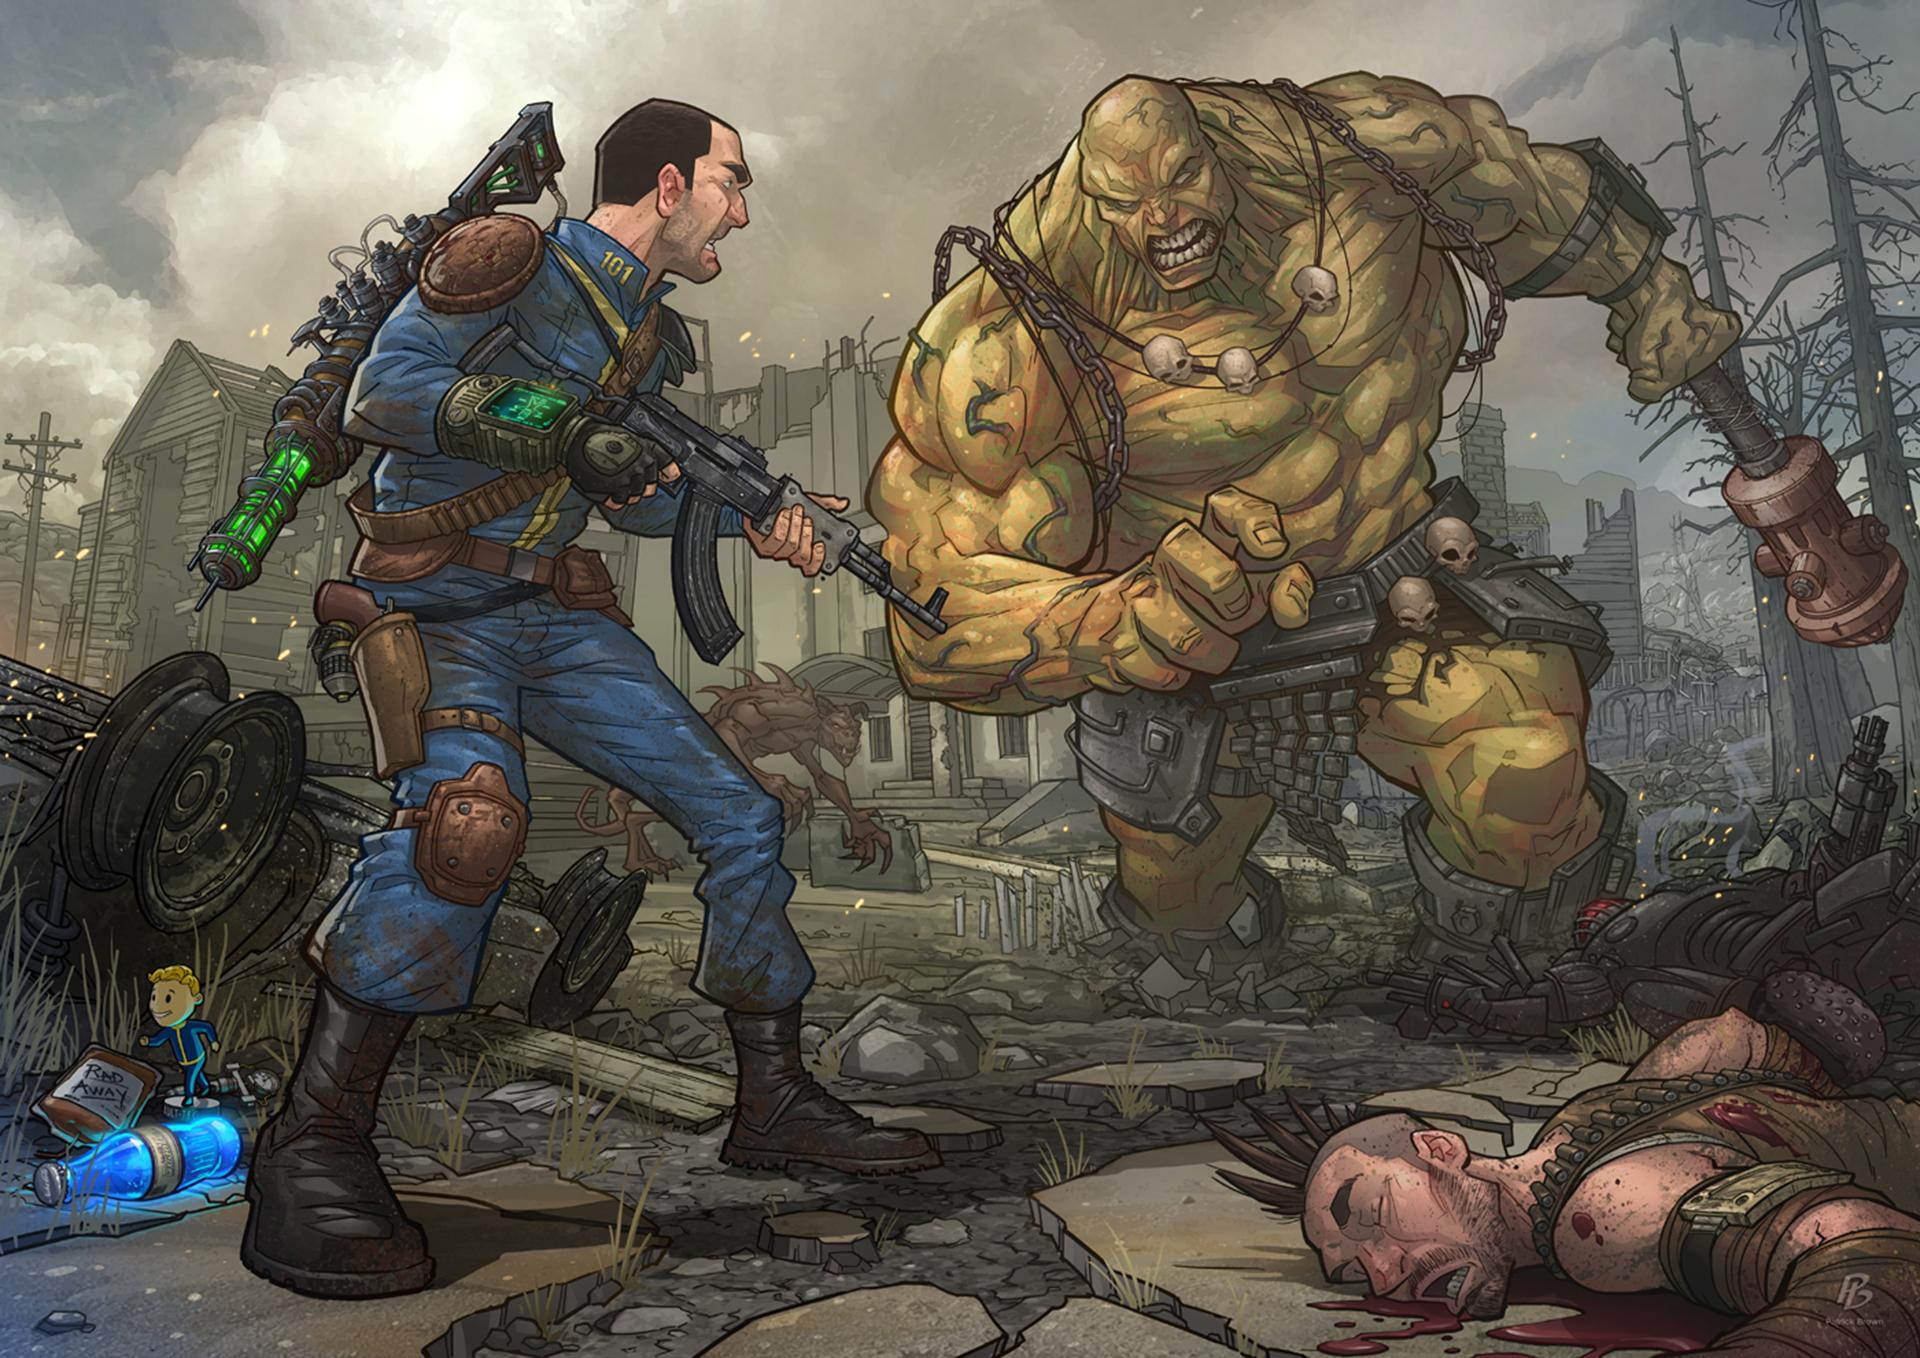 арт - Fallout 4 арт